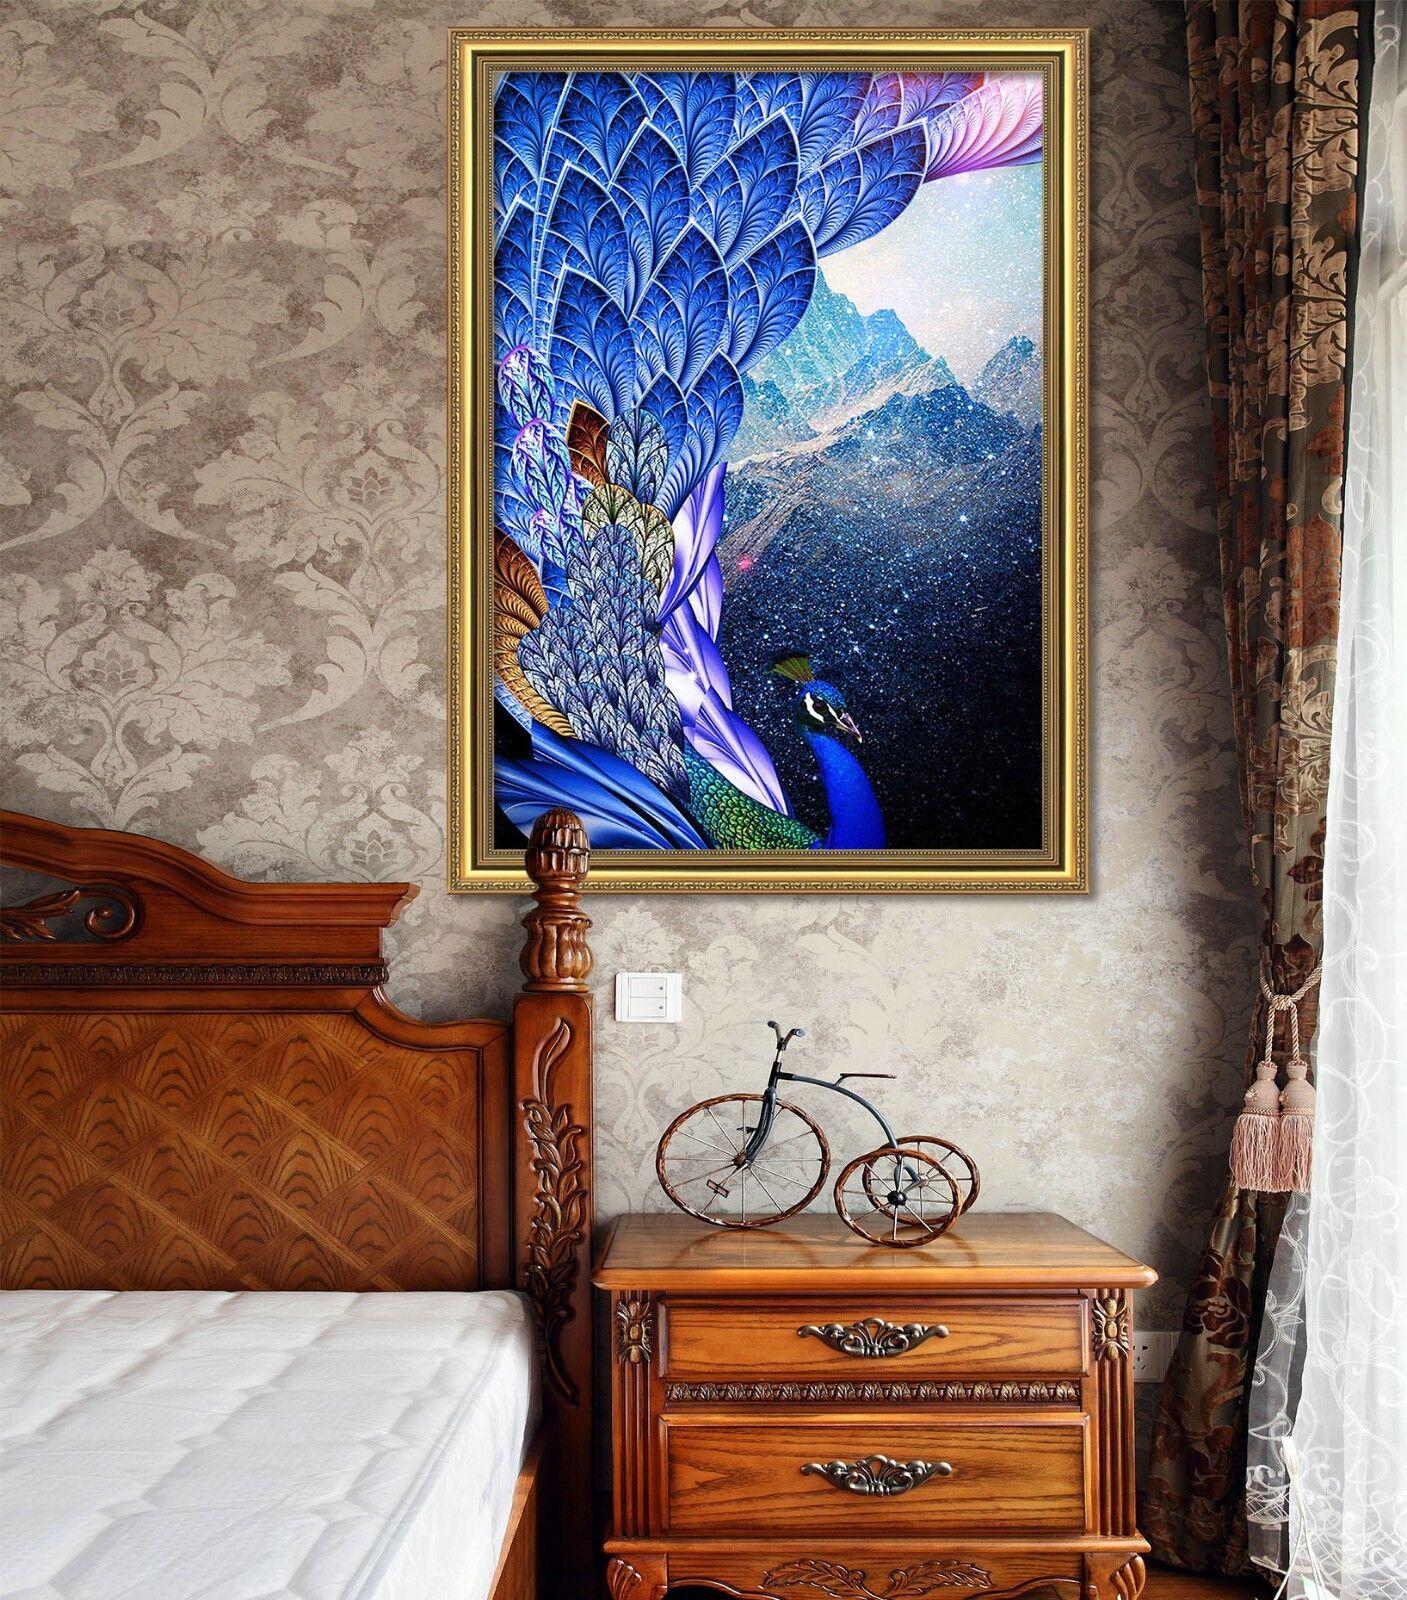 3D Azul Pavo Real 51 Enmarcado Póster Decoración del Hogar Pintura de Impresión Arte AJ